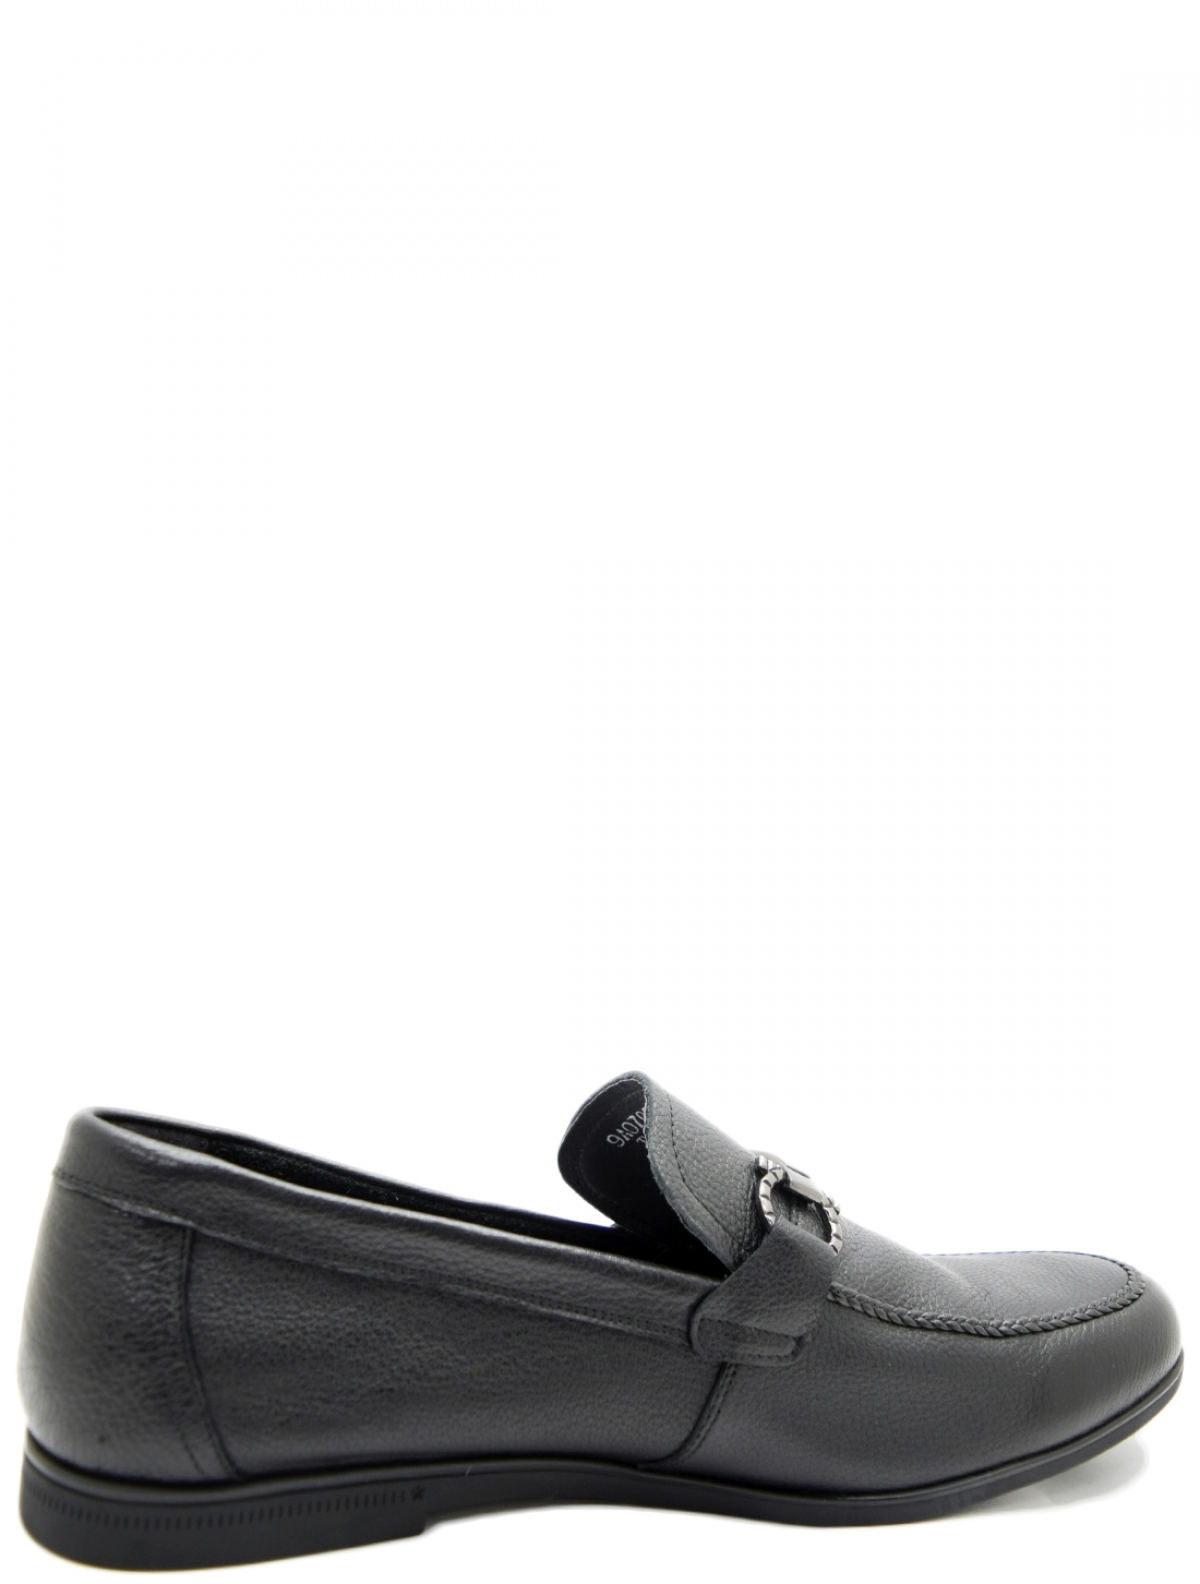 Roscote 9A0703A-P116-T3171 мужские туфли